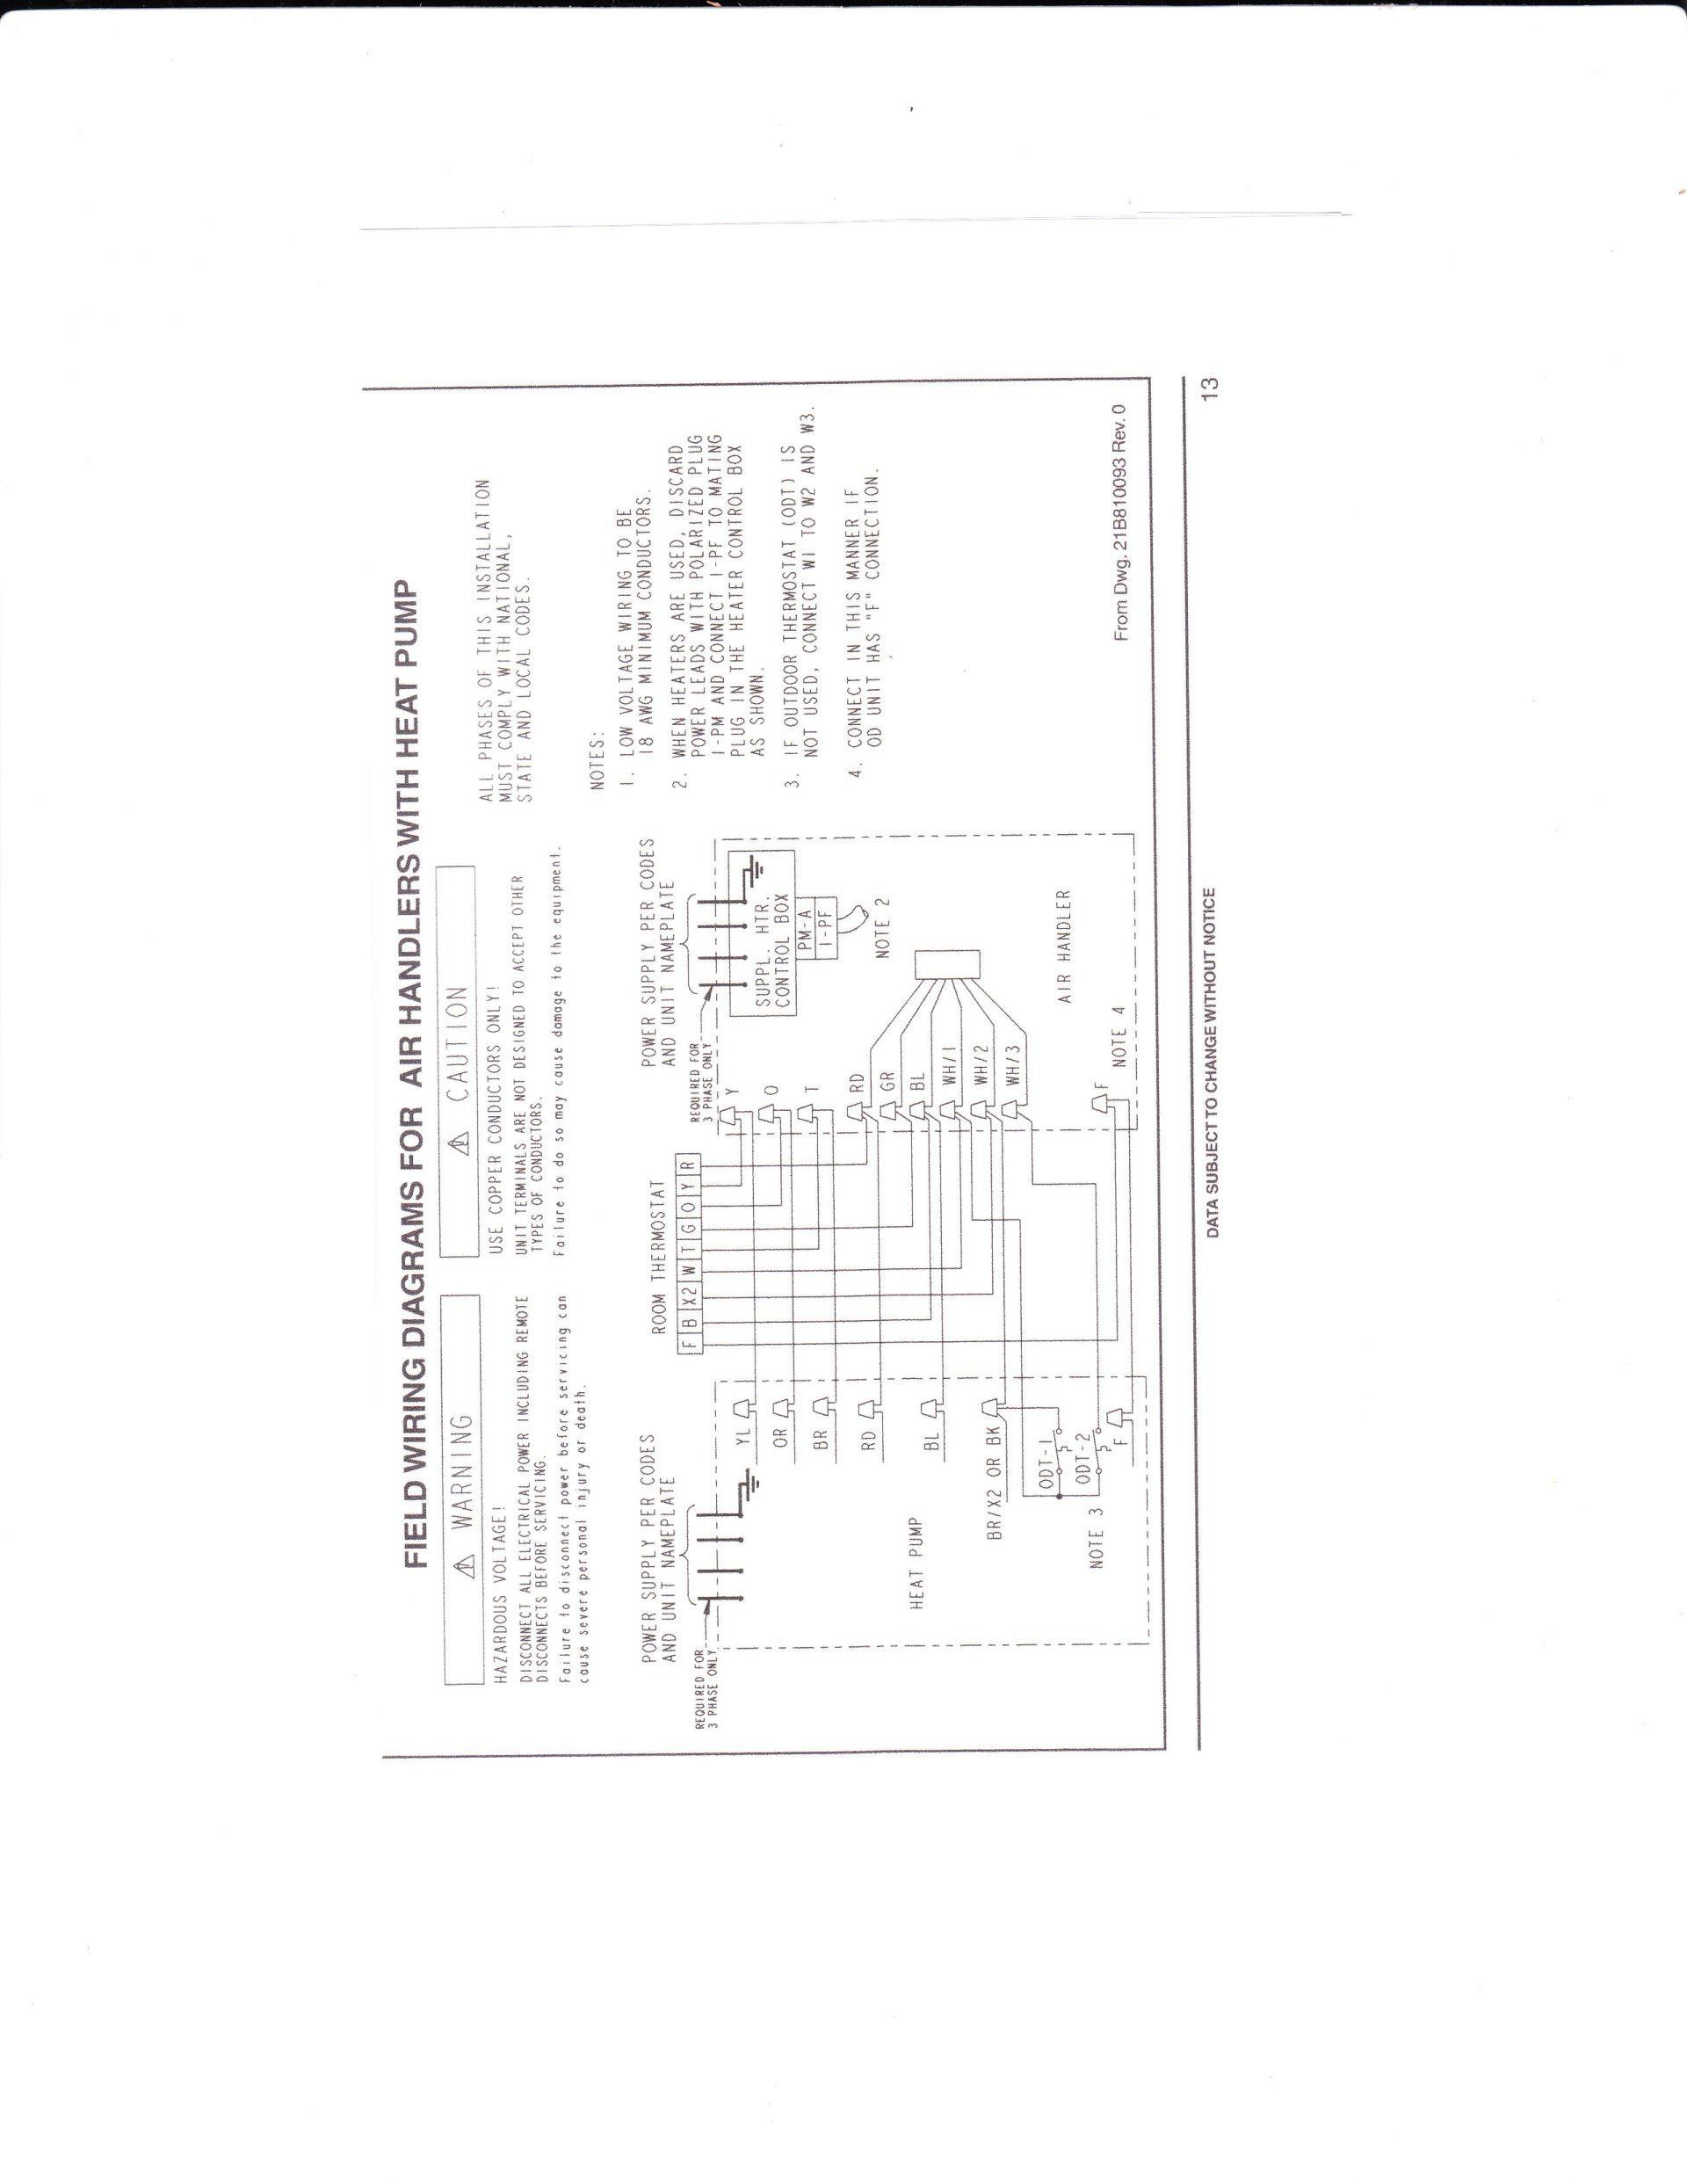 Trane Heat Pump Wiring Diagrams